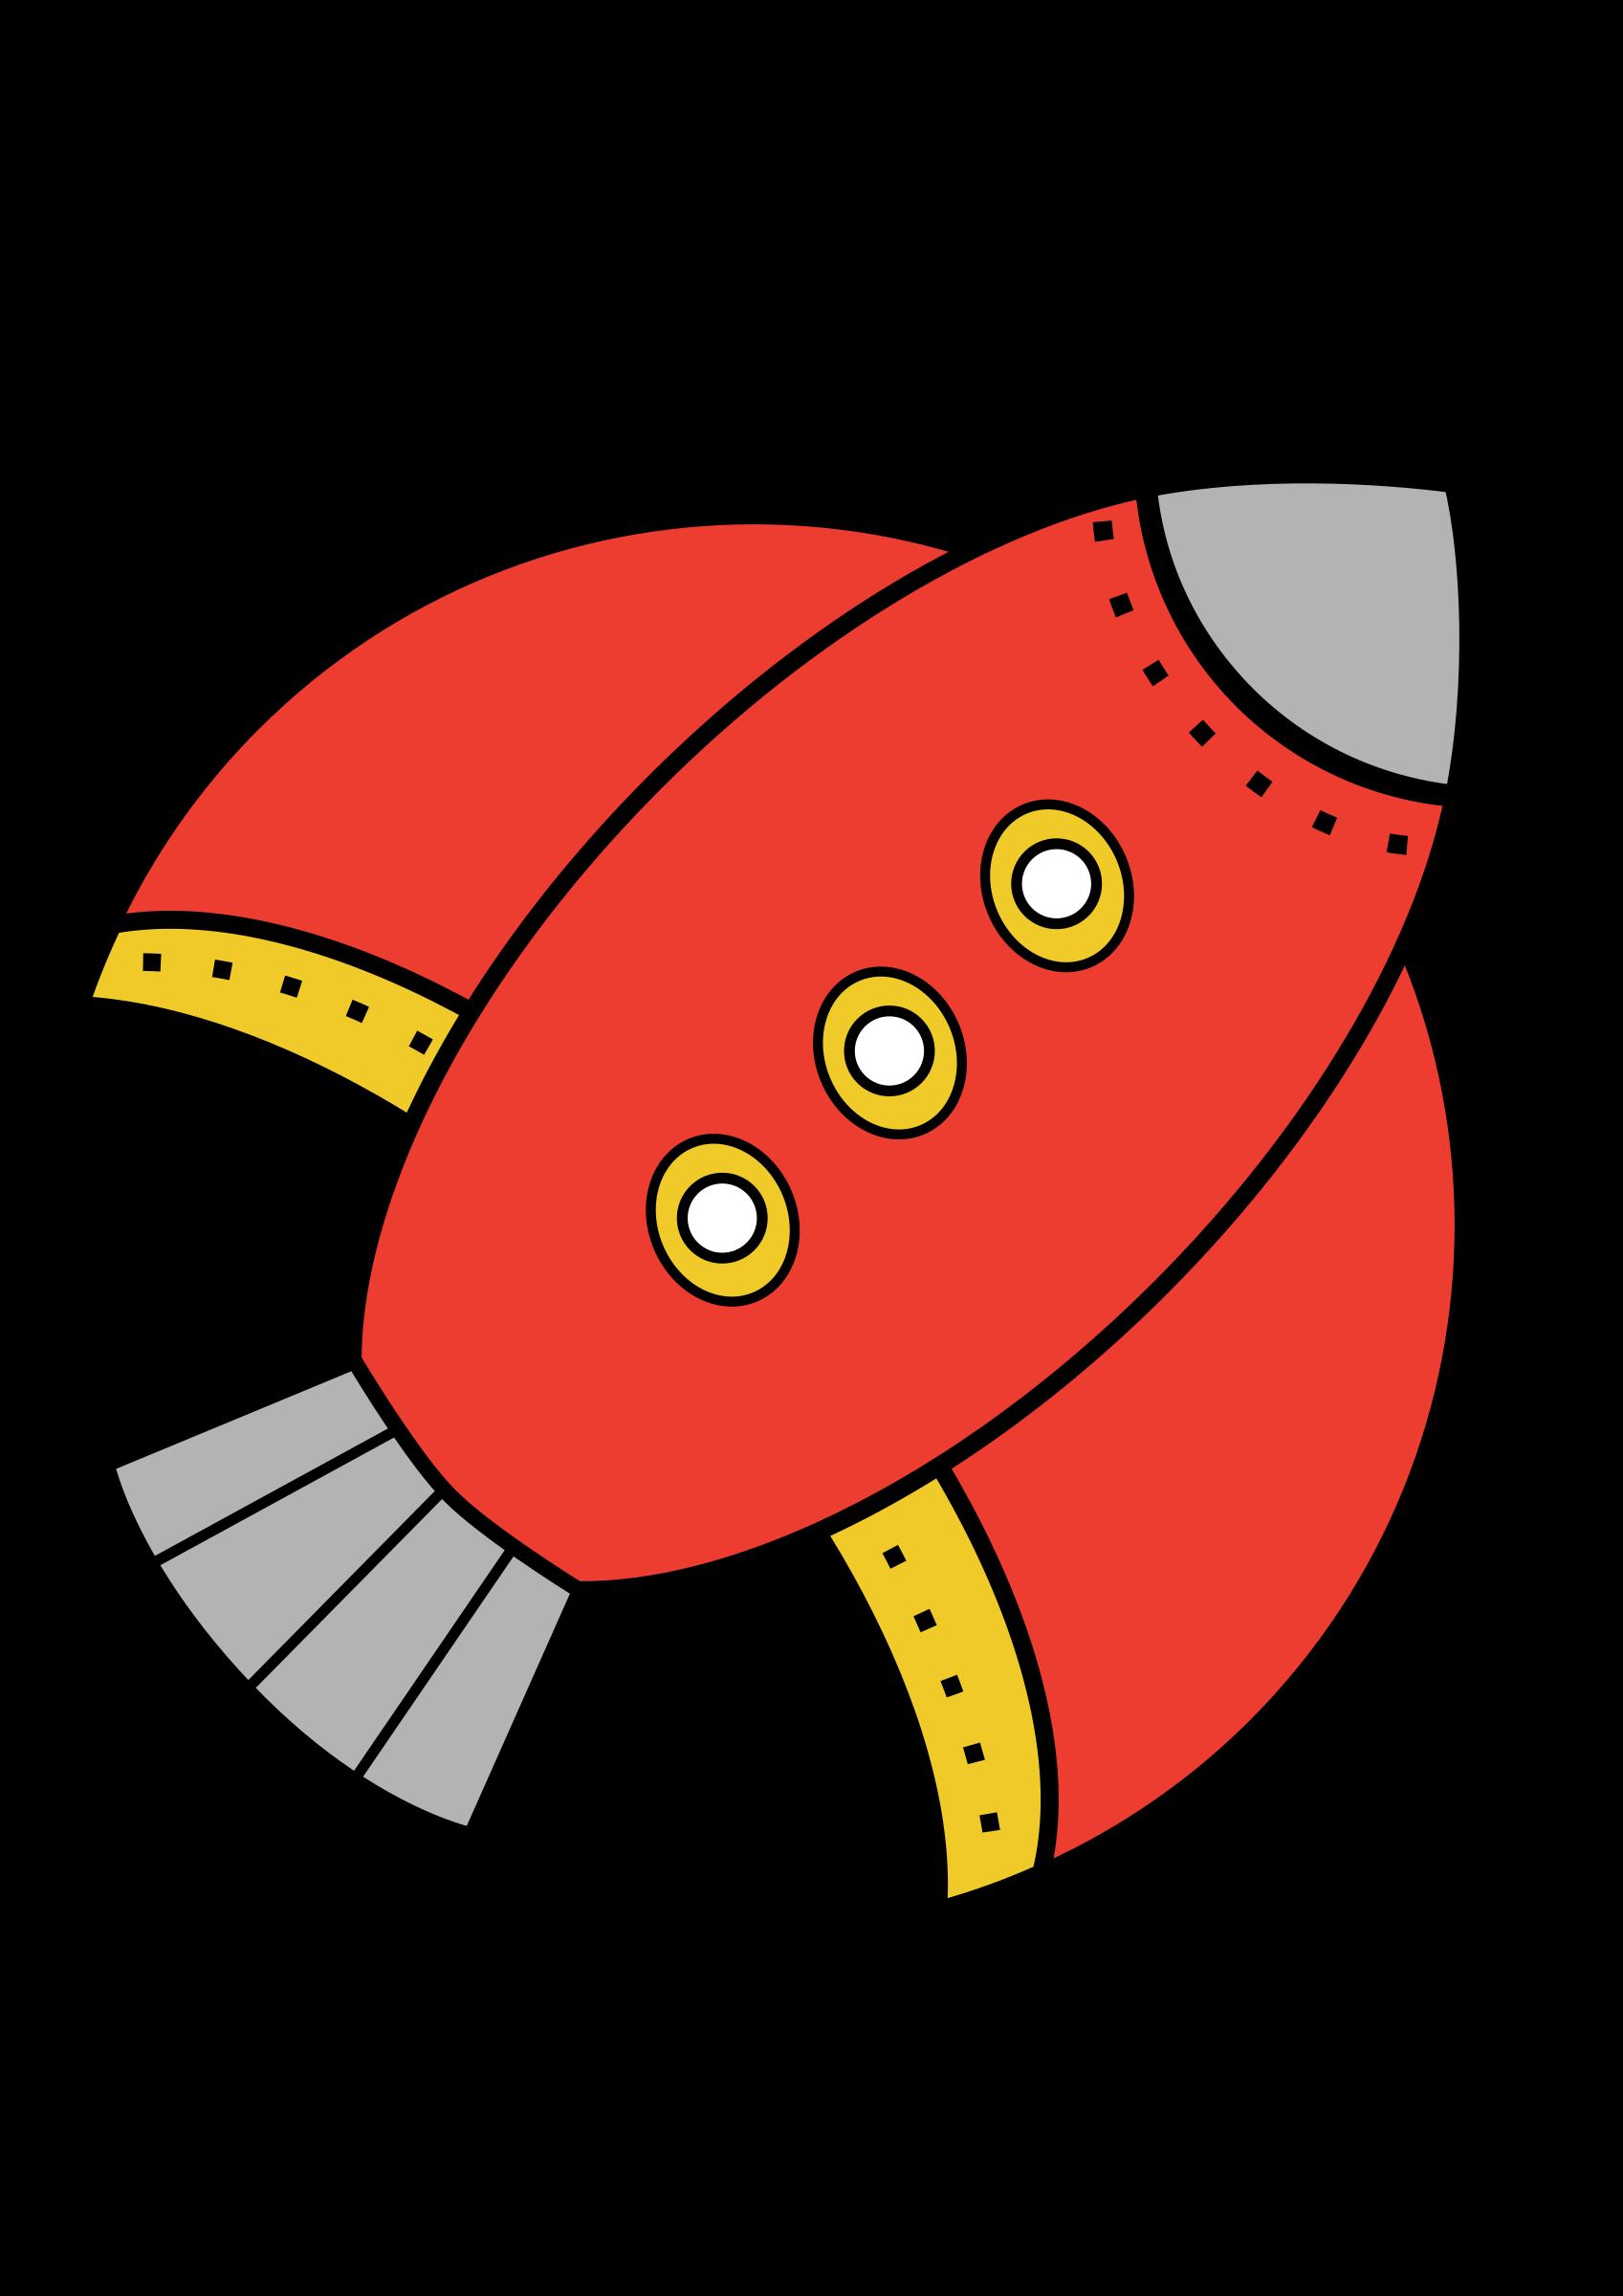 Big image png. Rocketship clipart red rocket